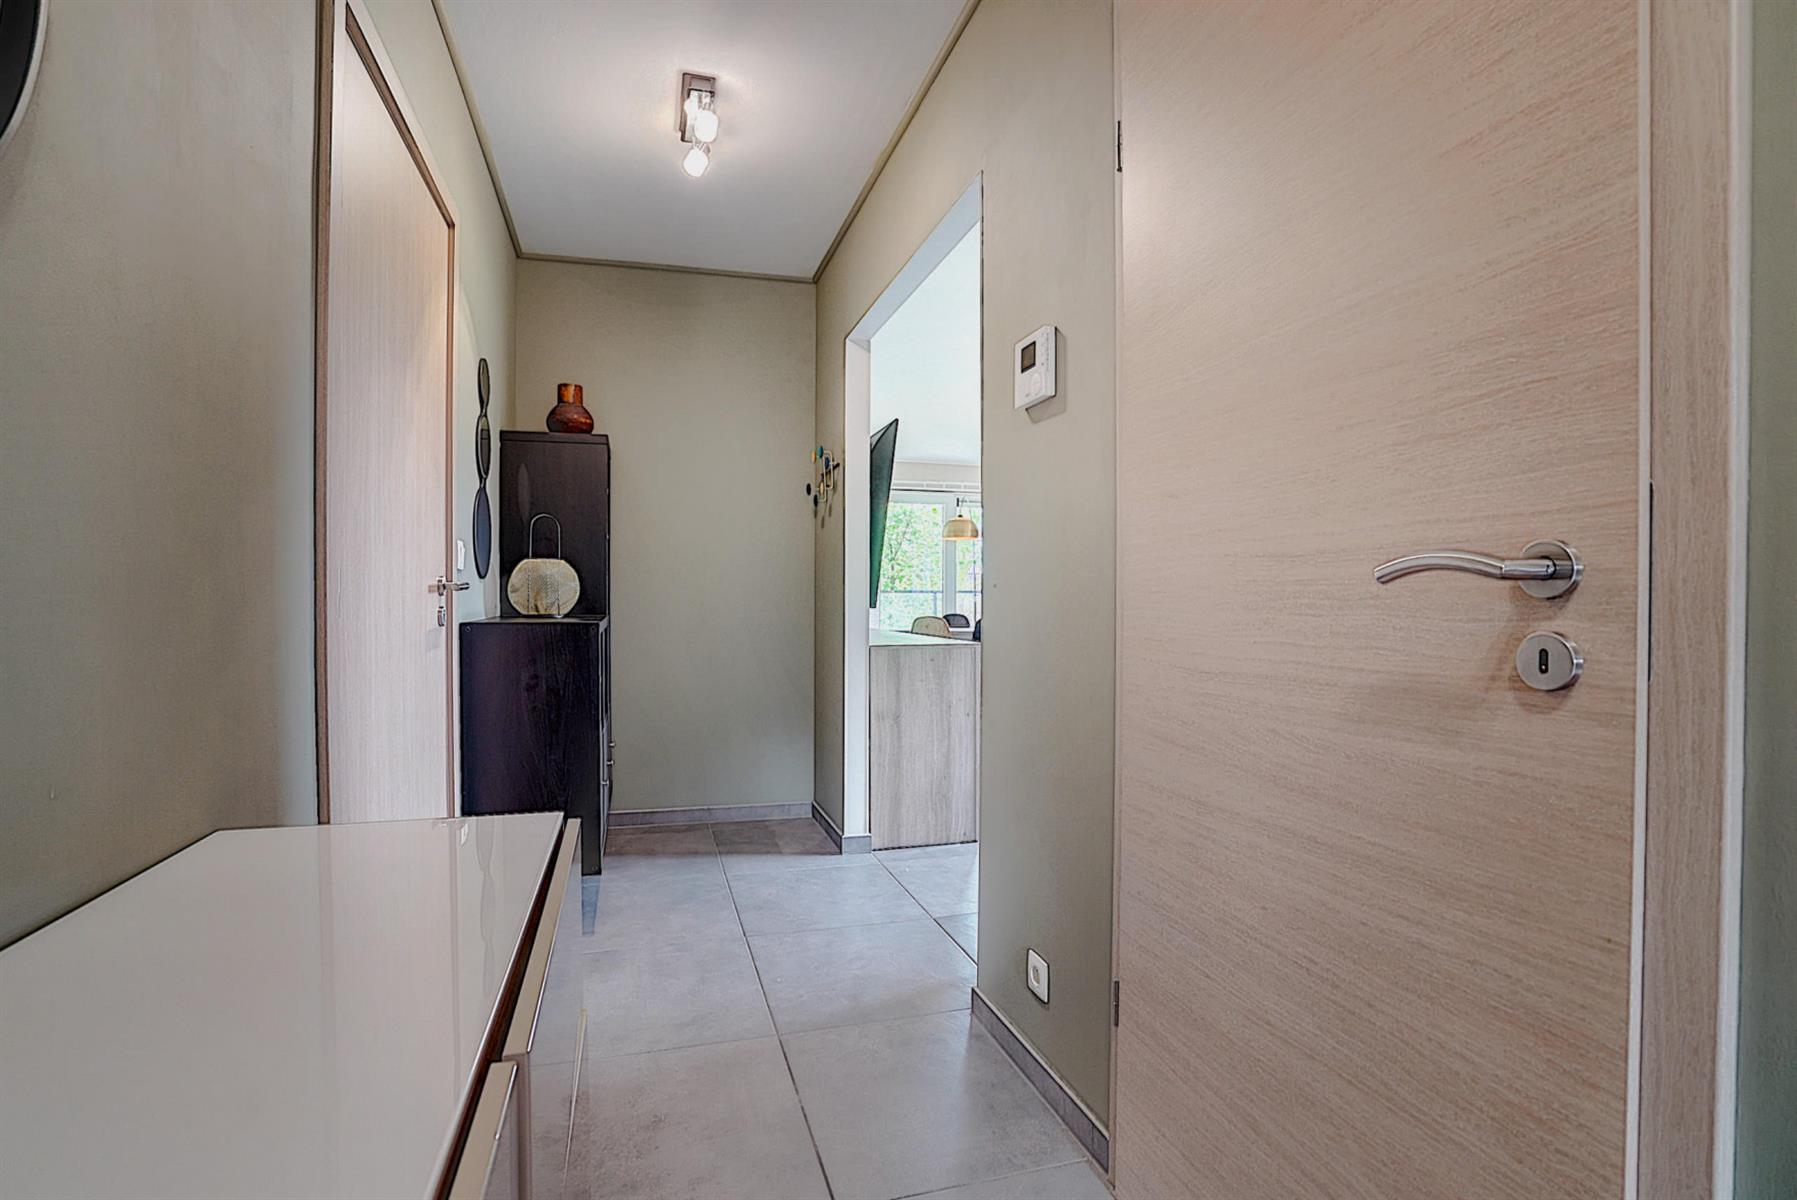 Appartement - Grâce-hollogne - #4364483-14